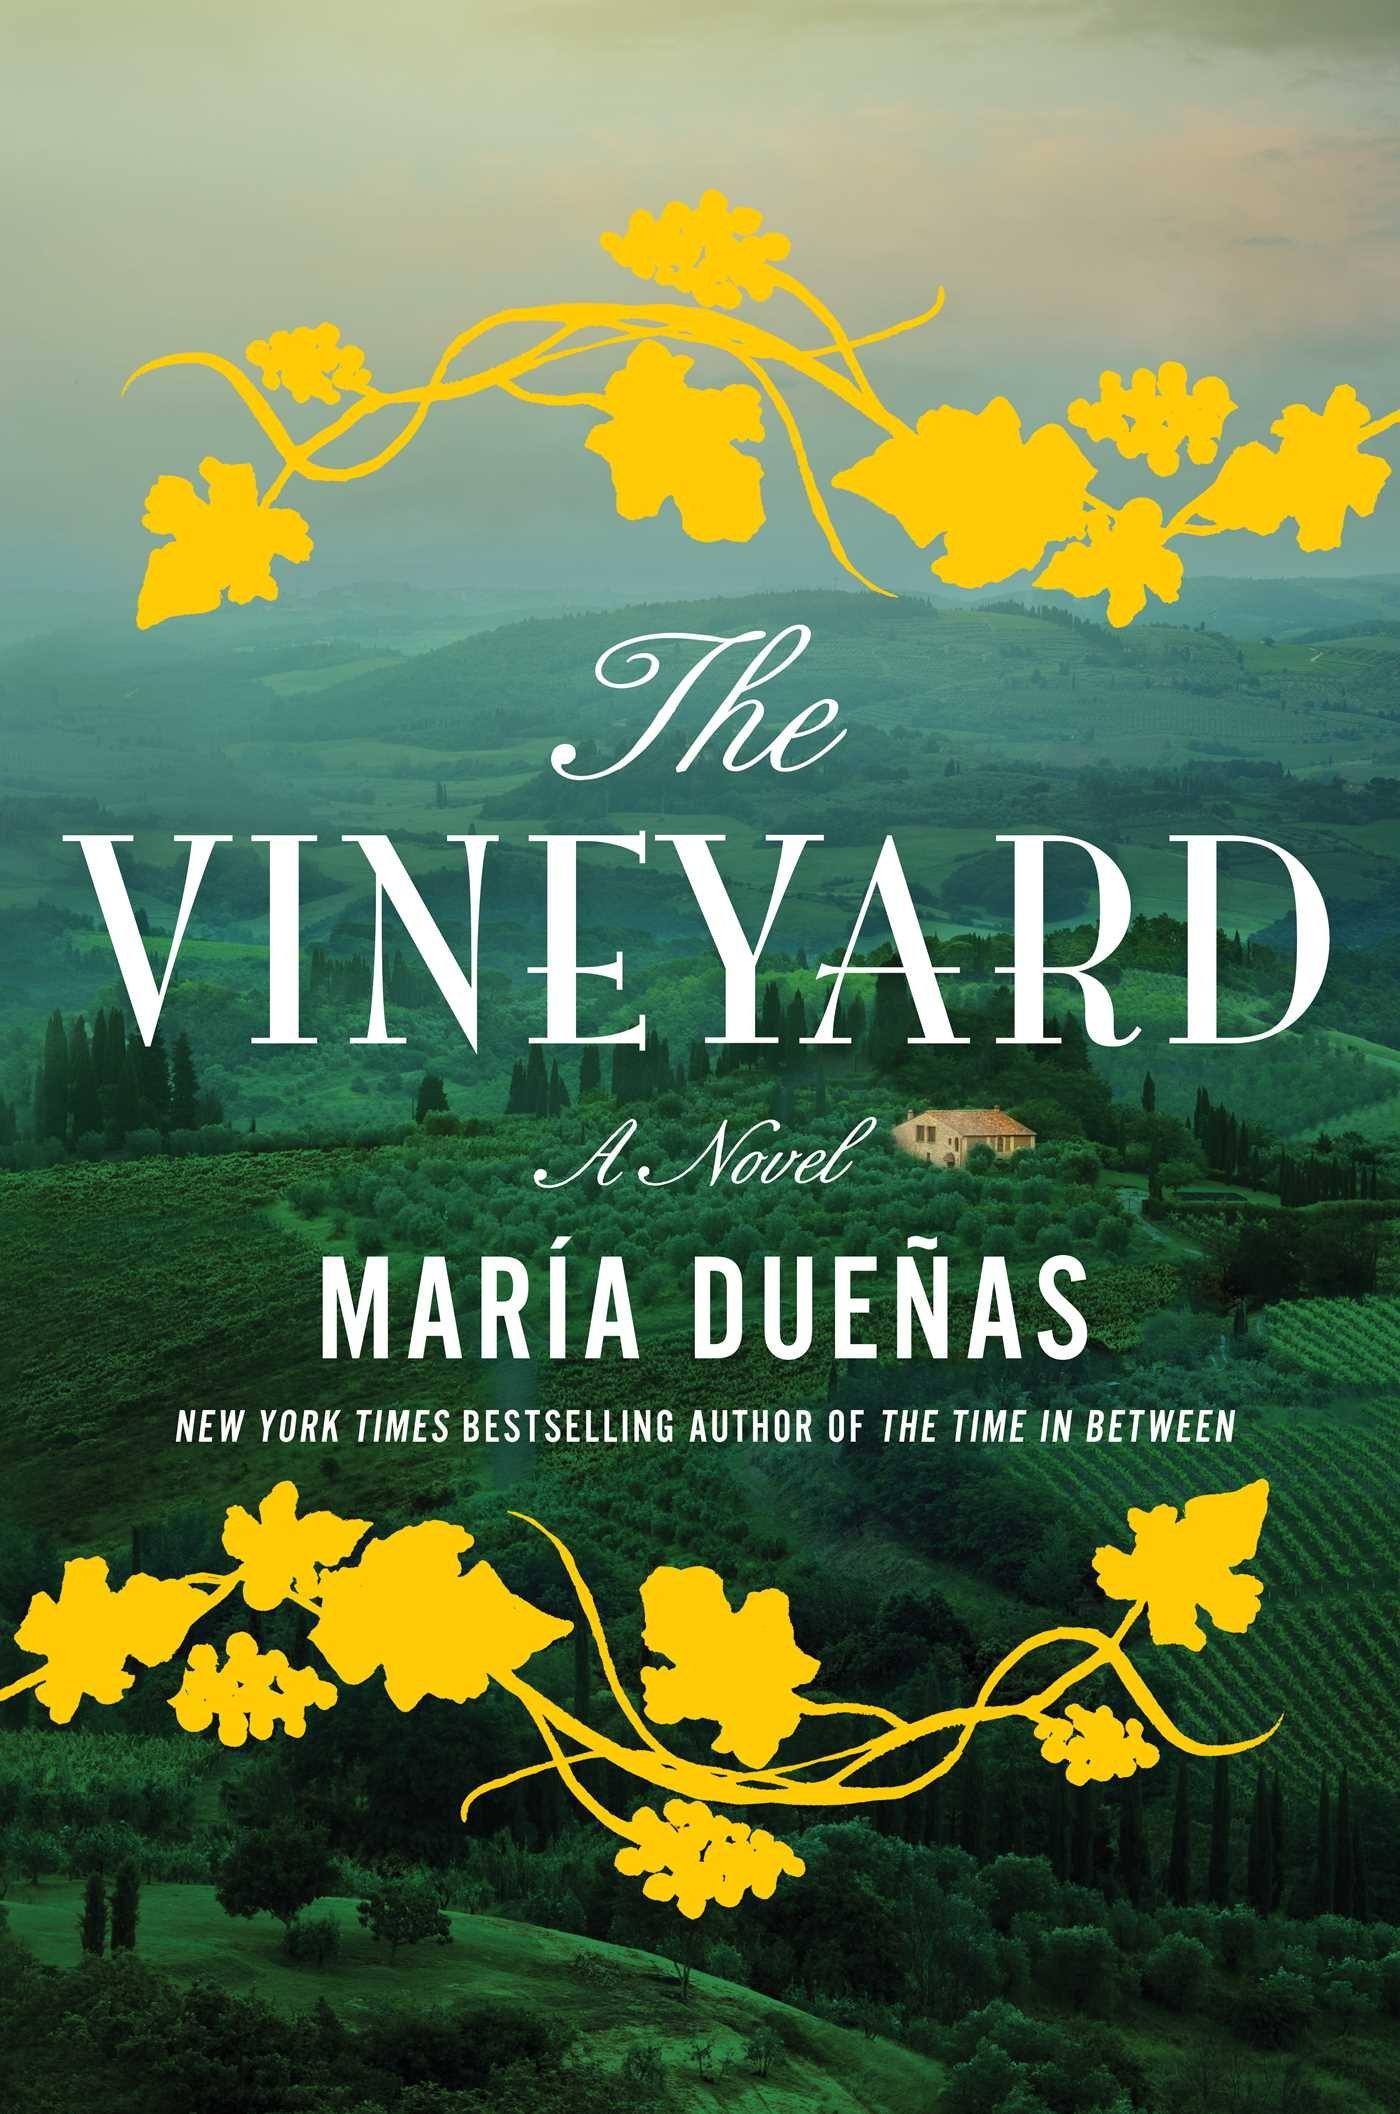 amazon com the vineyard a novel 9781501124532 maria duenas books